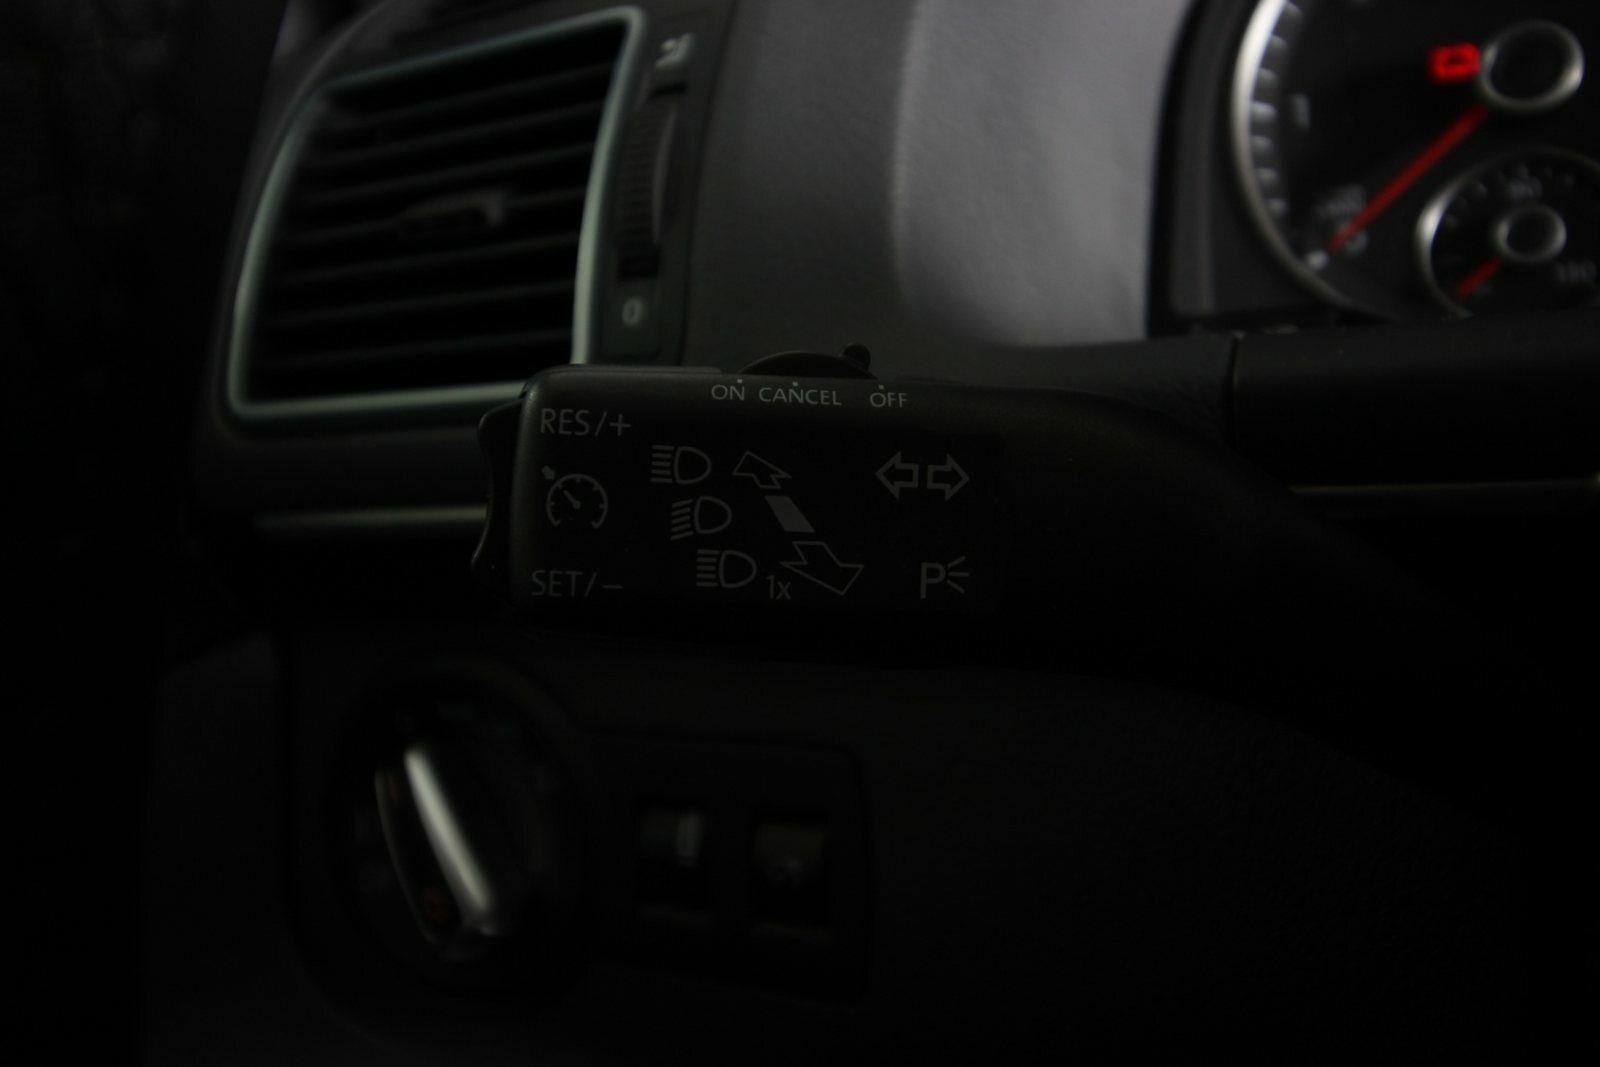 VW Touran TDi 140 Highline DSG BMT 7prs